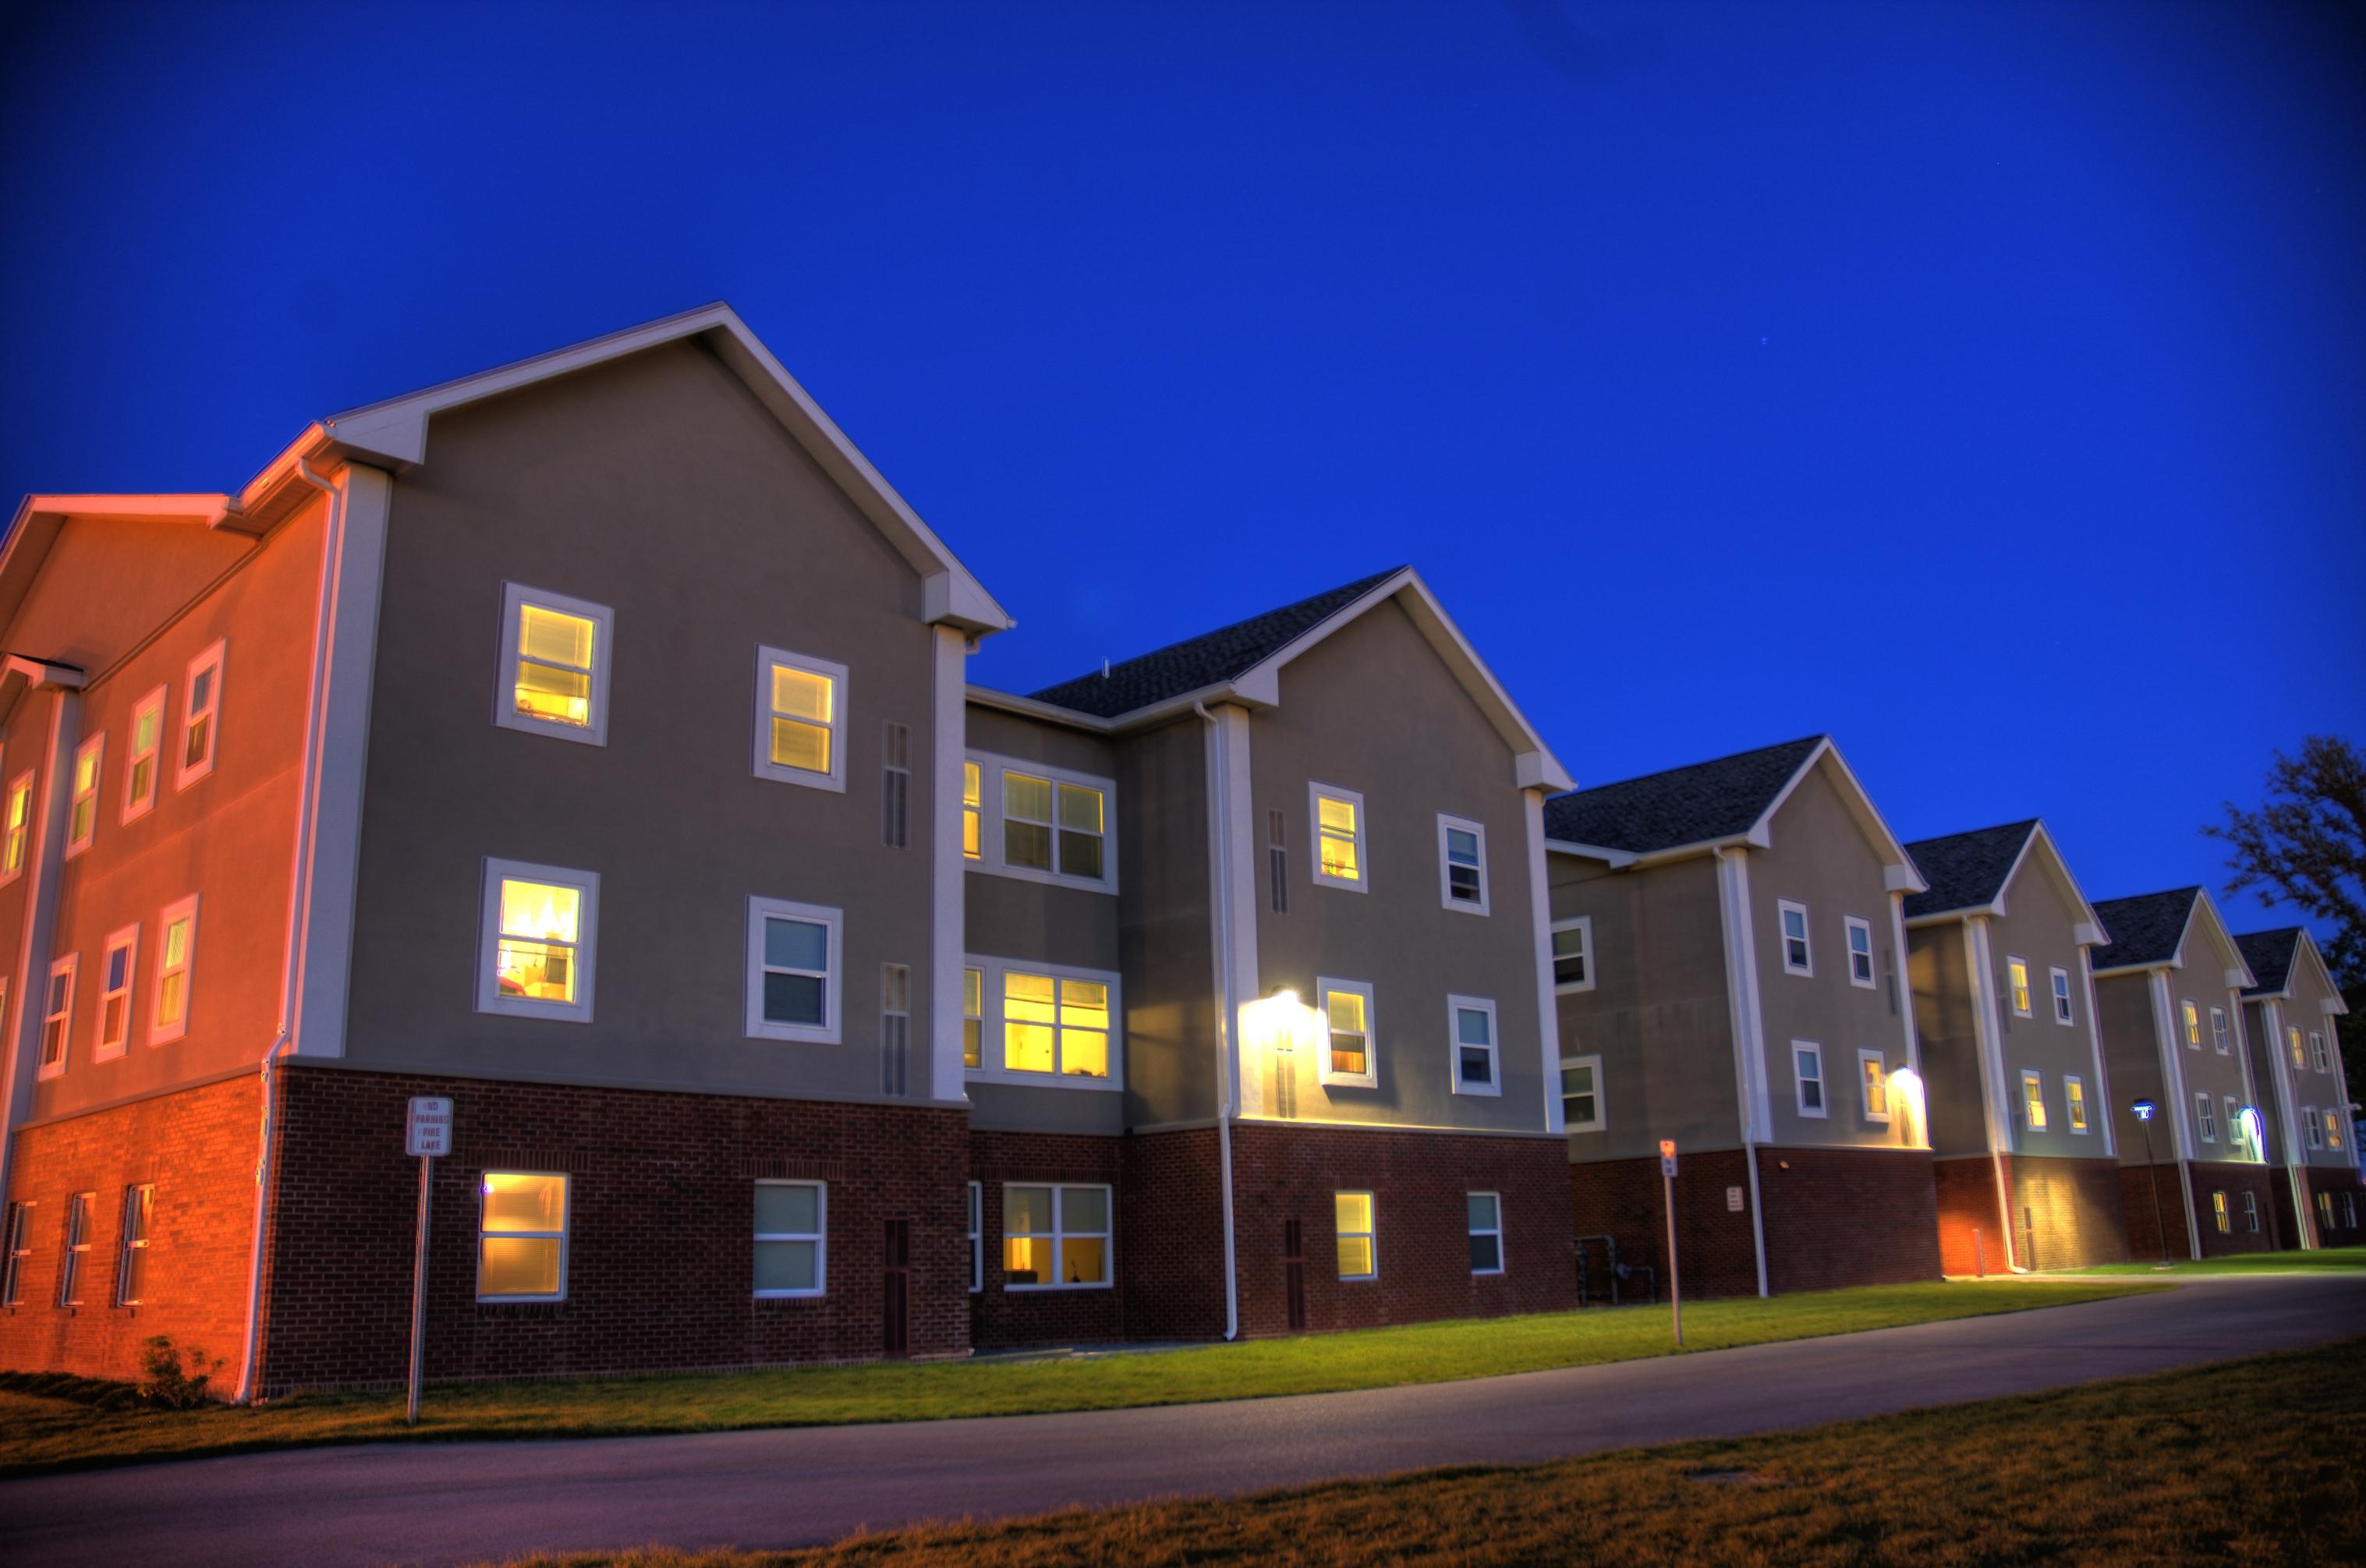 FileMonroe Community College Campus Dorms 2